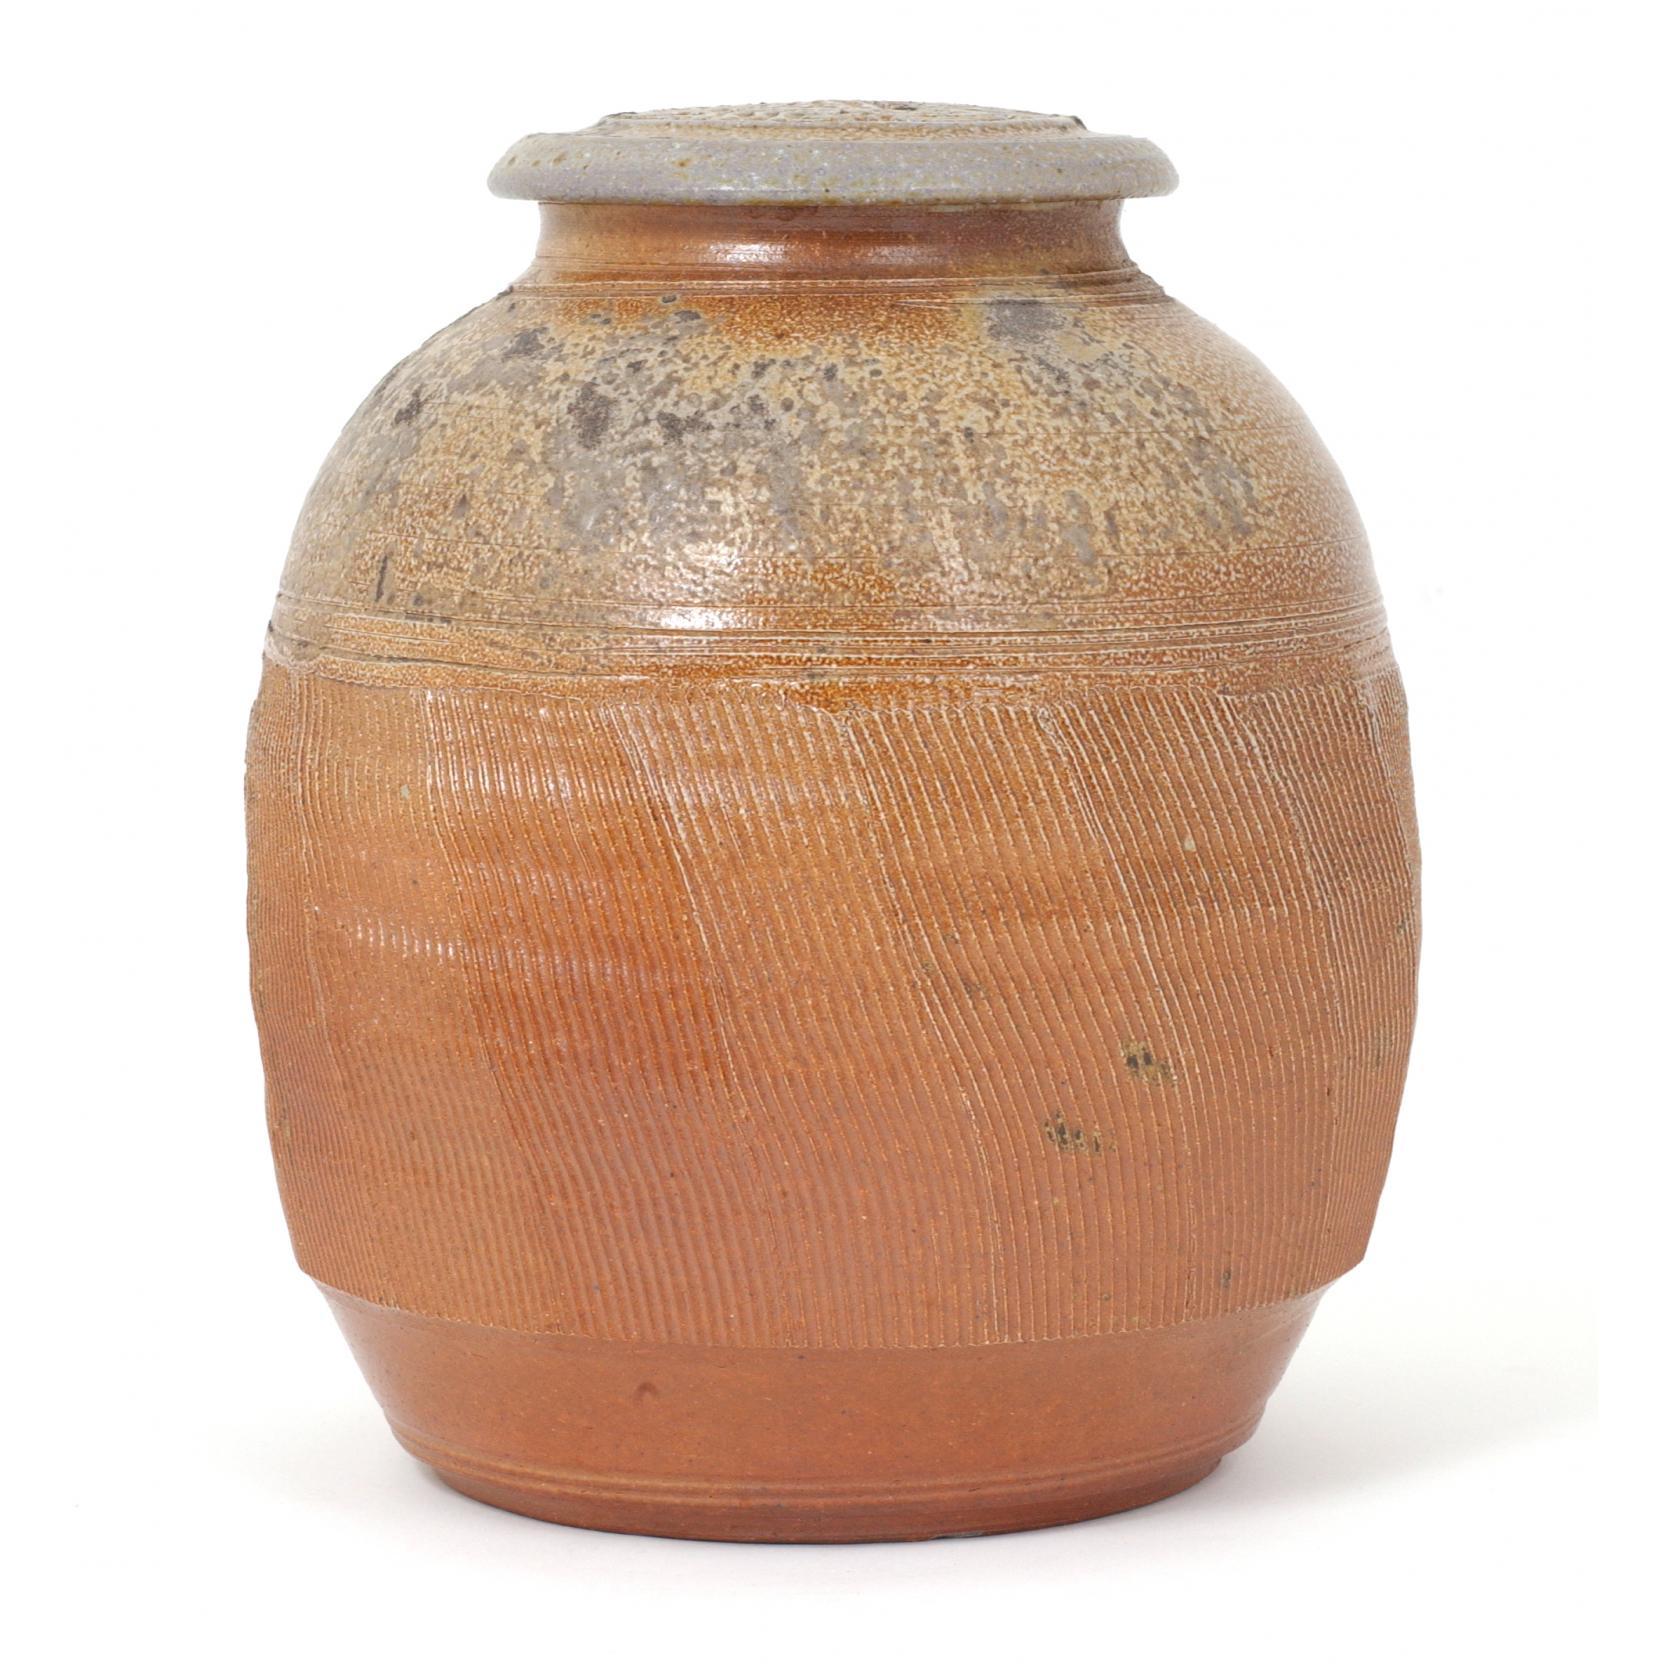 nc-pottery-lidded-jar-cynthia-bringle-penland-nc